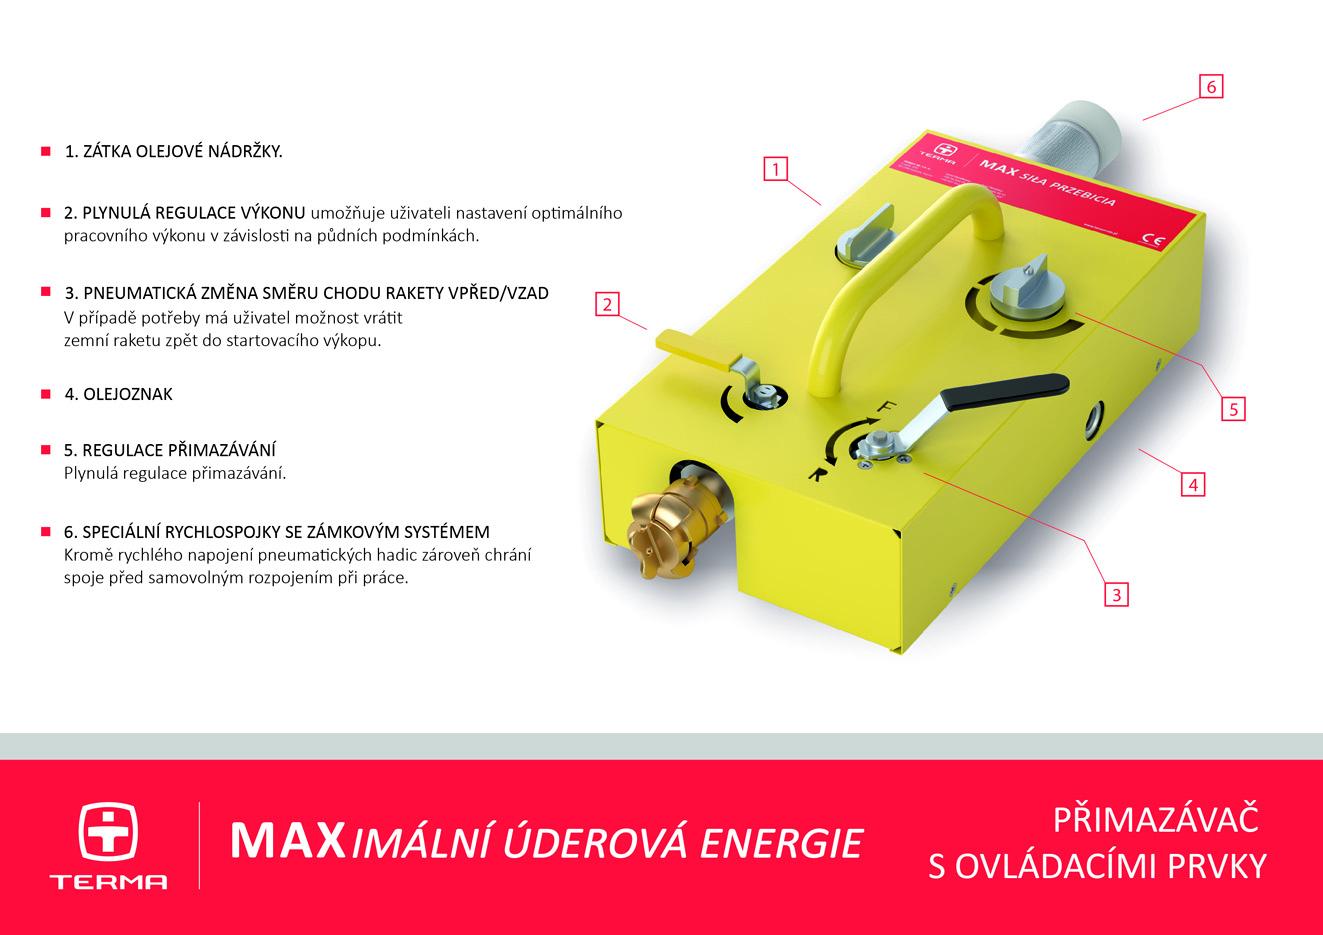 https://www.manek.cz/images/Terma/Olejovac_TERMA_w.jpg